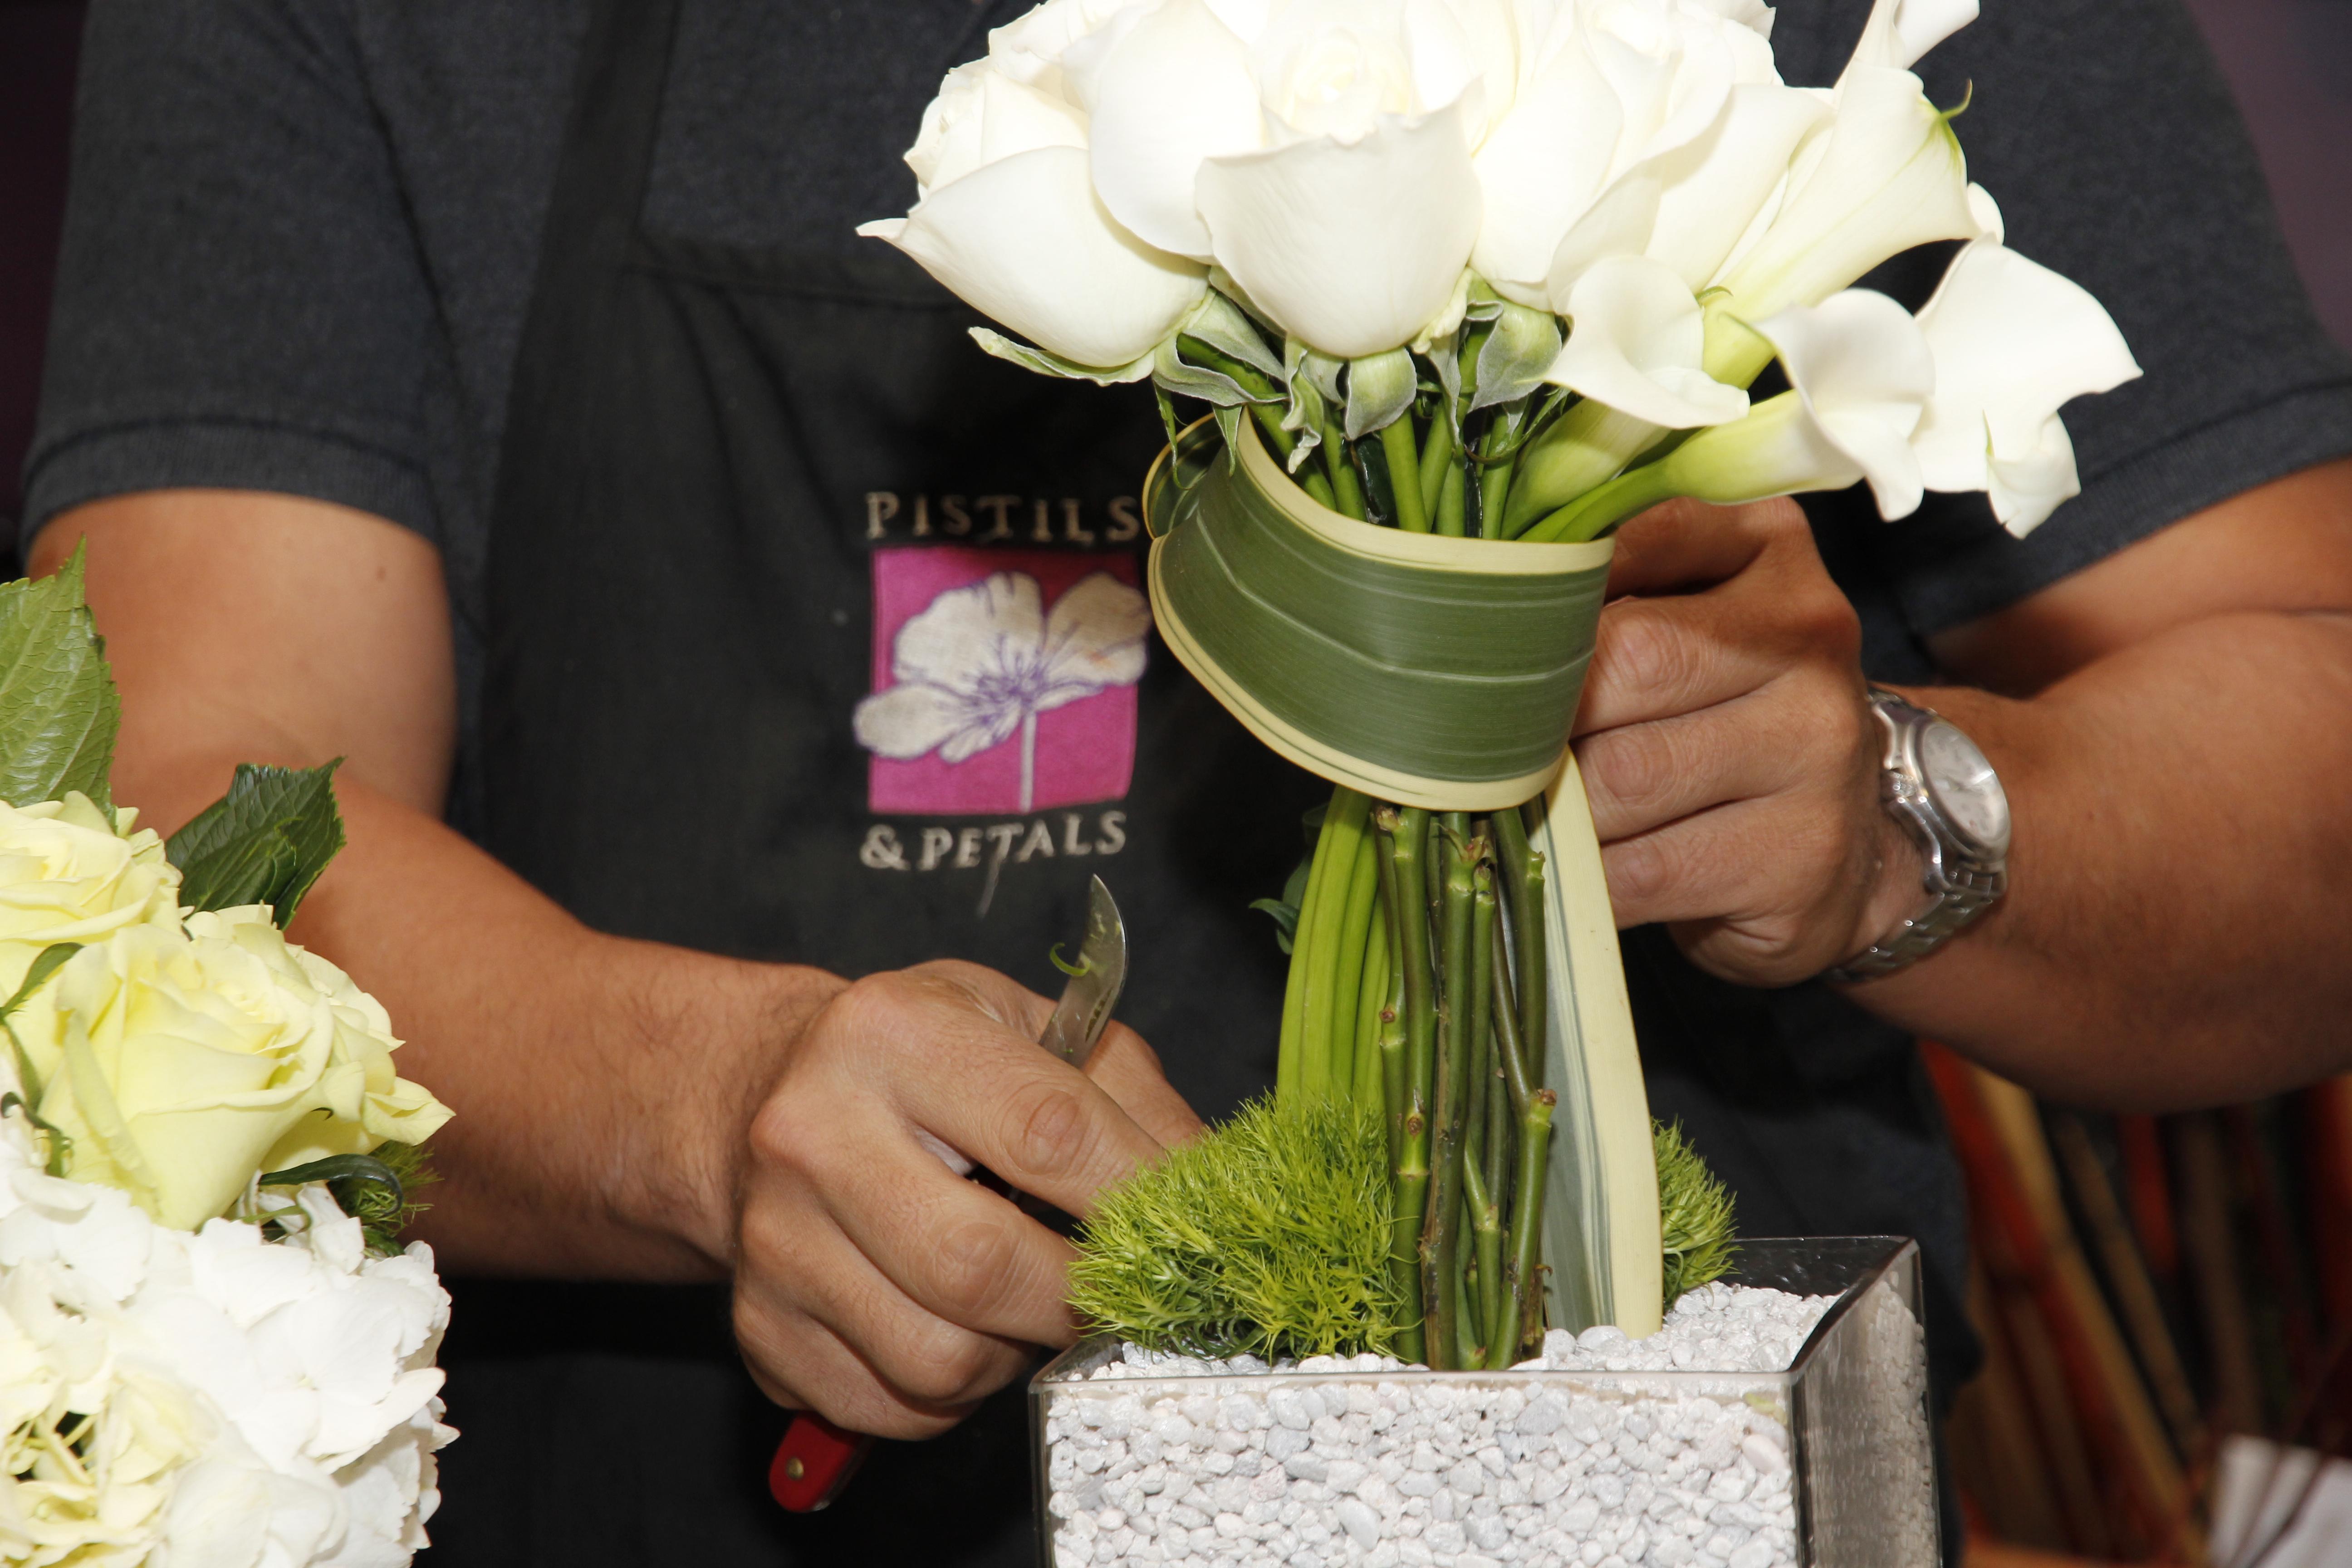 Pistils & Petals Miami Beach - Get Ink Pr